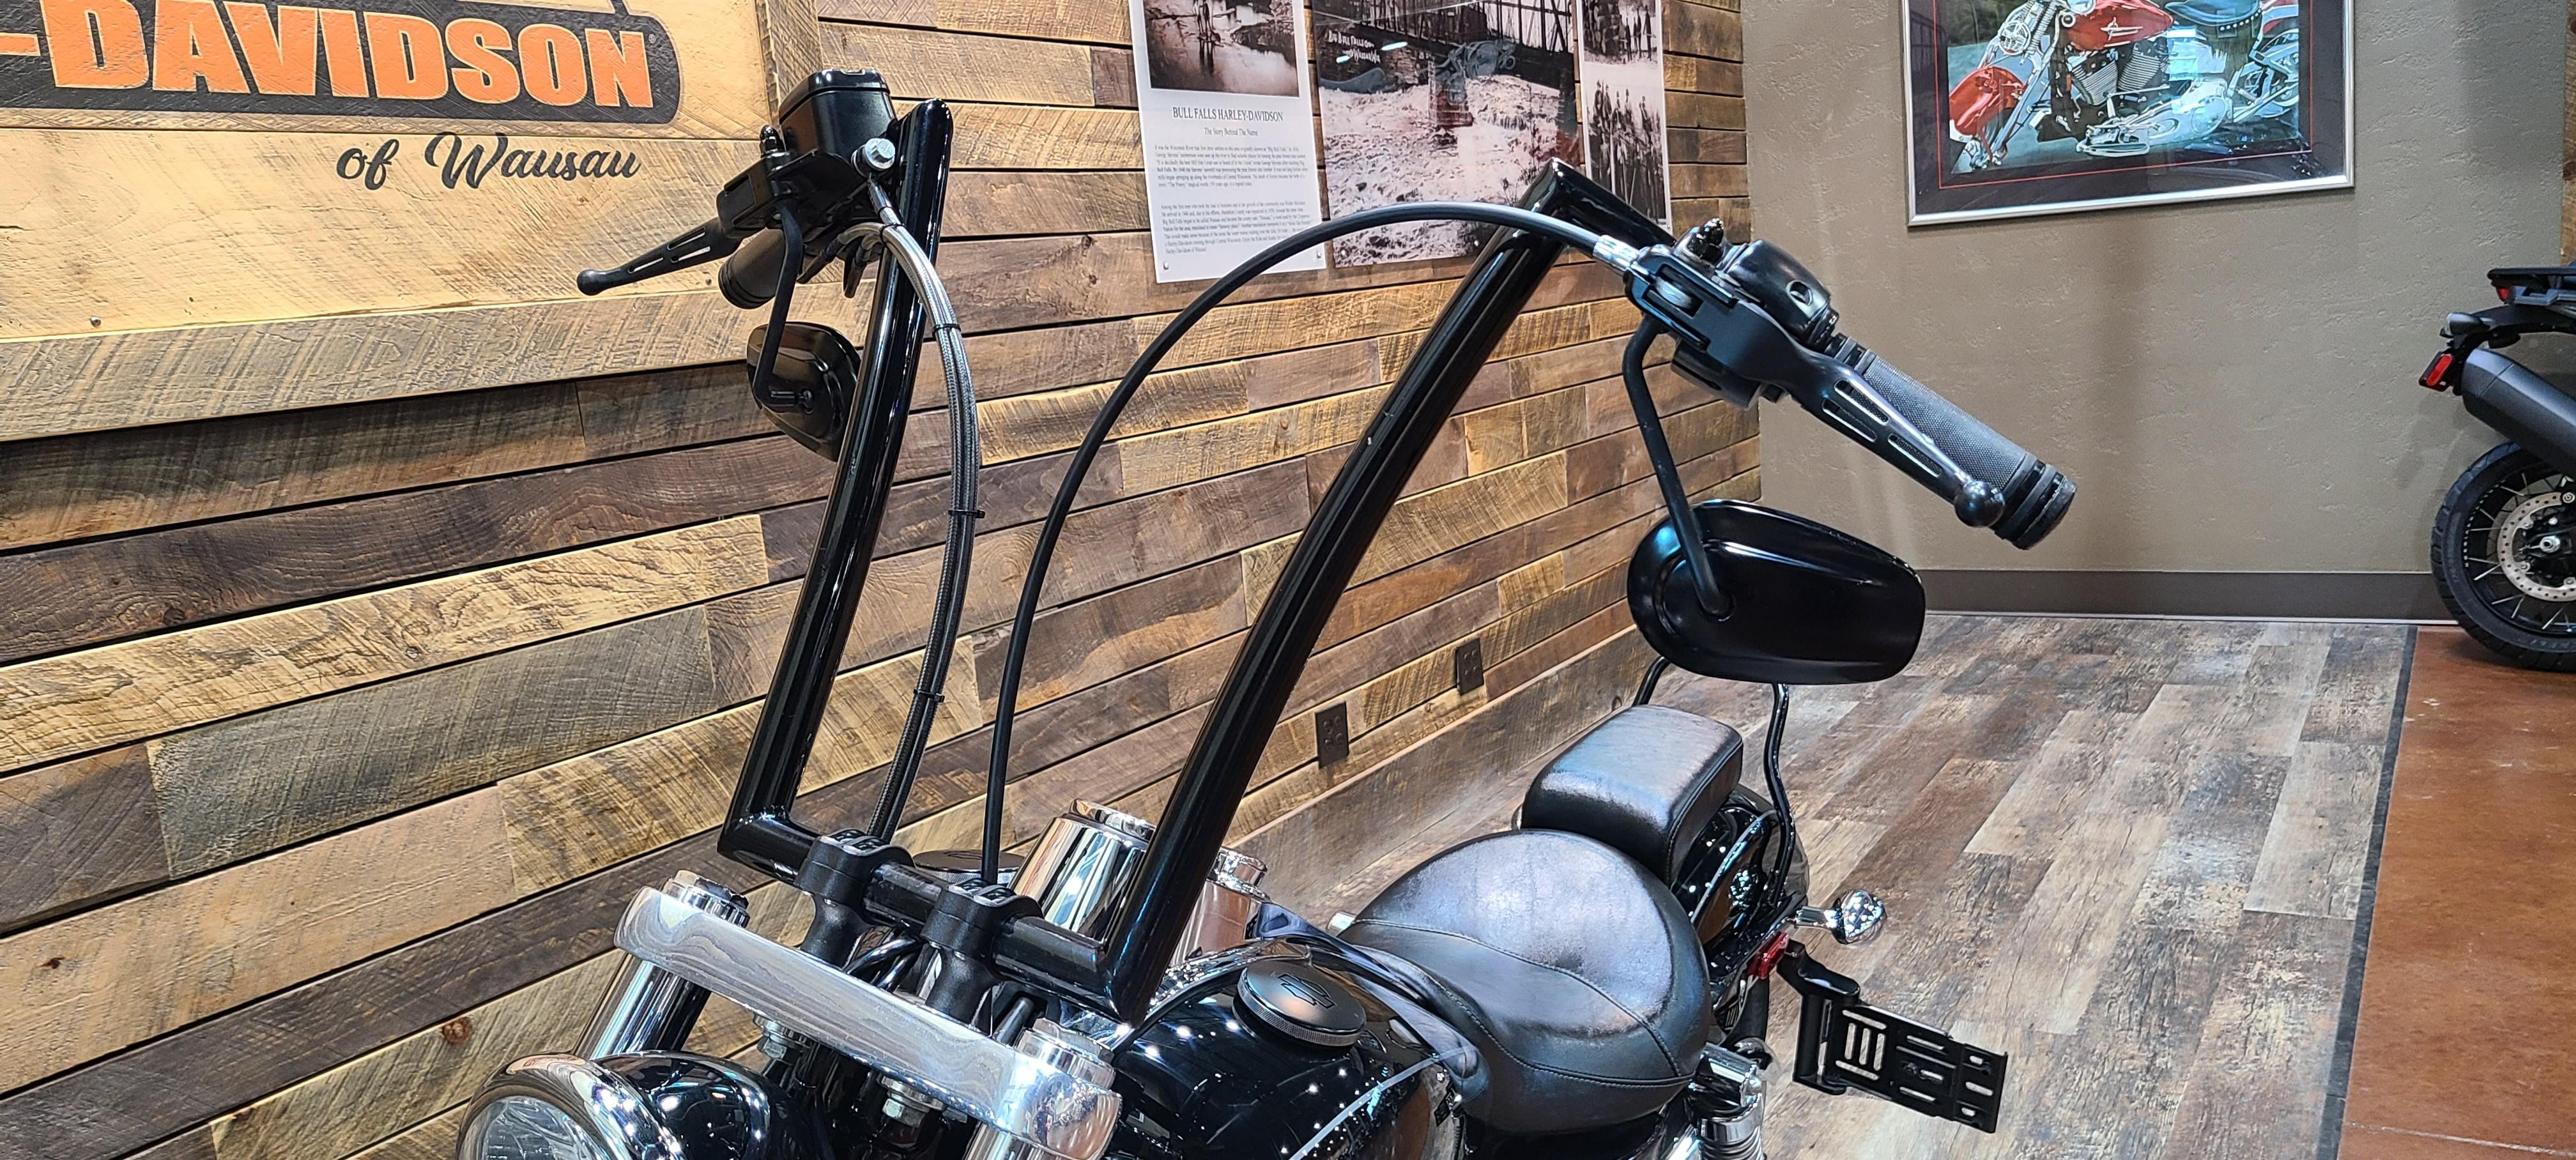 2013 Harley-Davidson Dyna Wide Glide at Bull Falls Harley-Davidson